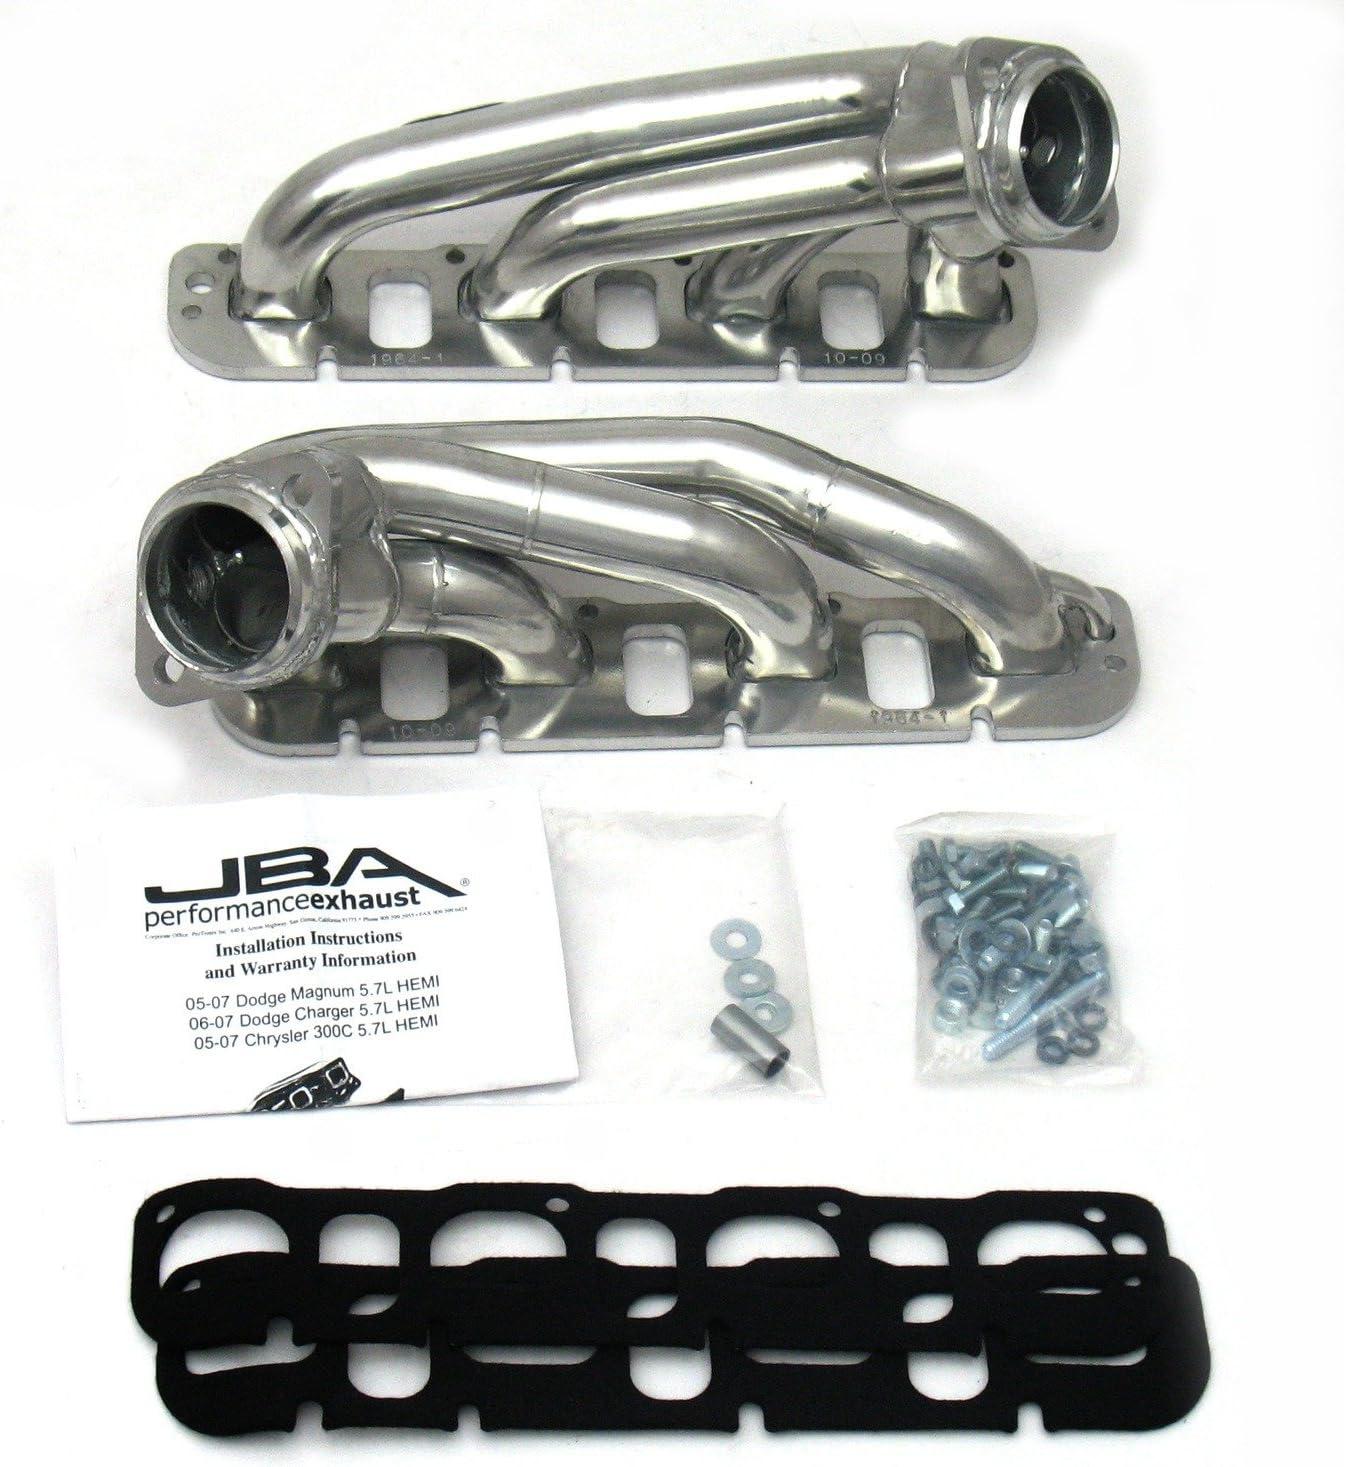 "For Dodge 5.7L Hemi Exhaust Headers BBK 4012 1-3//4/"" Shorty Tuned Length Perf"